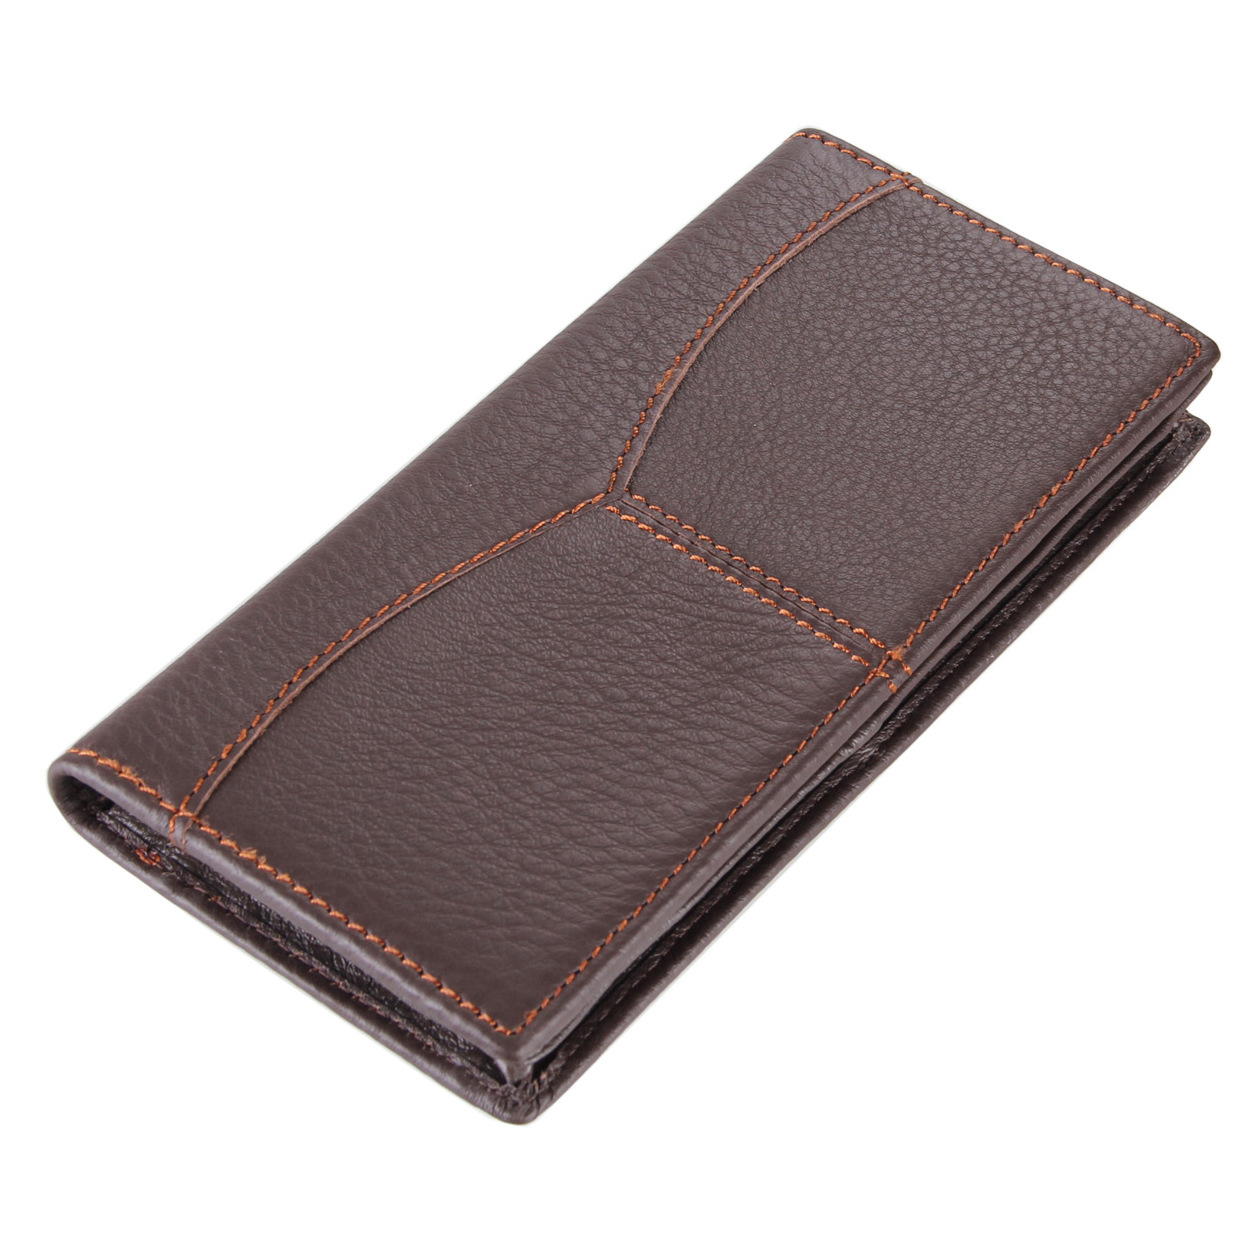 100% Genuine Leather Wallets Men Wallets Clutch Carteira Masculina Carteras Male Handy Bags Purse Mens Monederos Wallet 8059